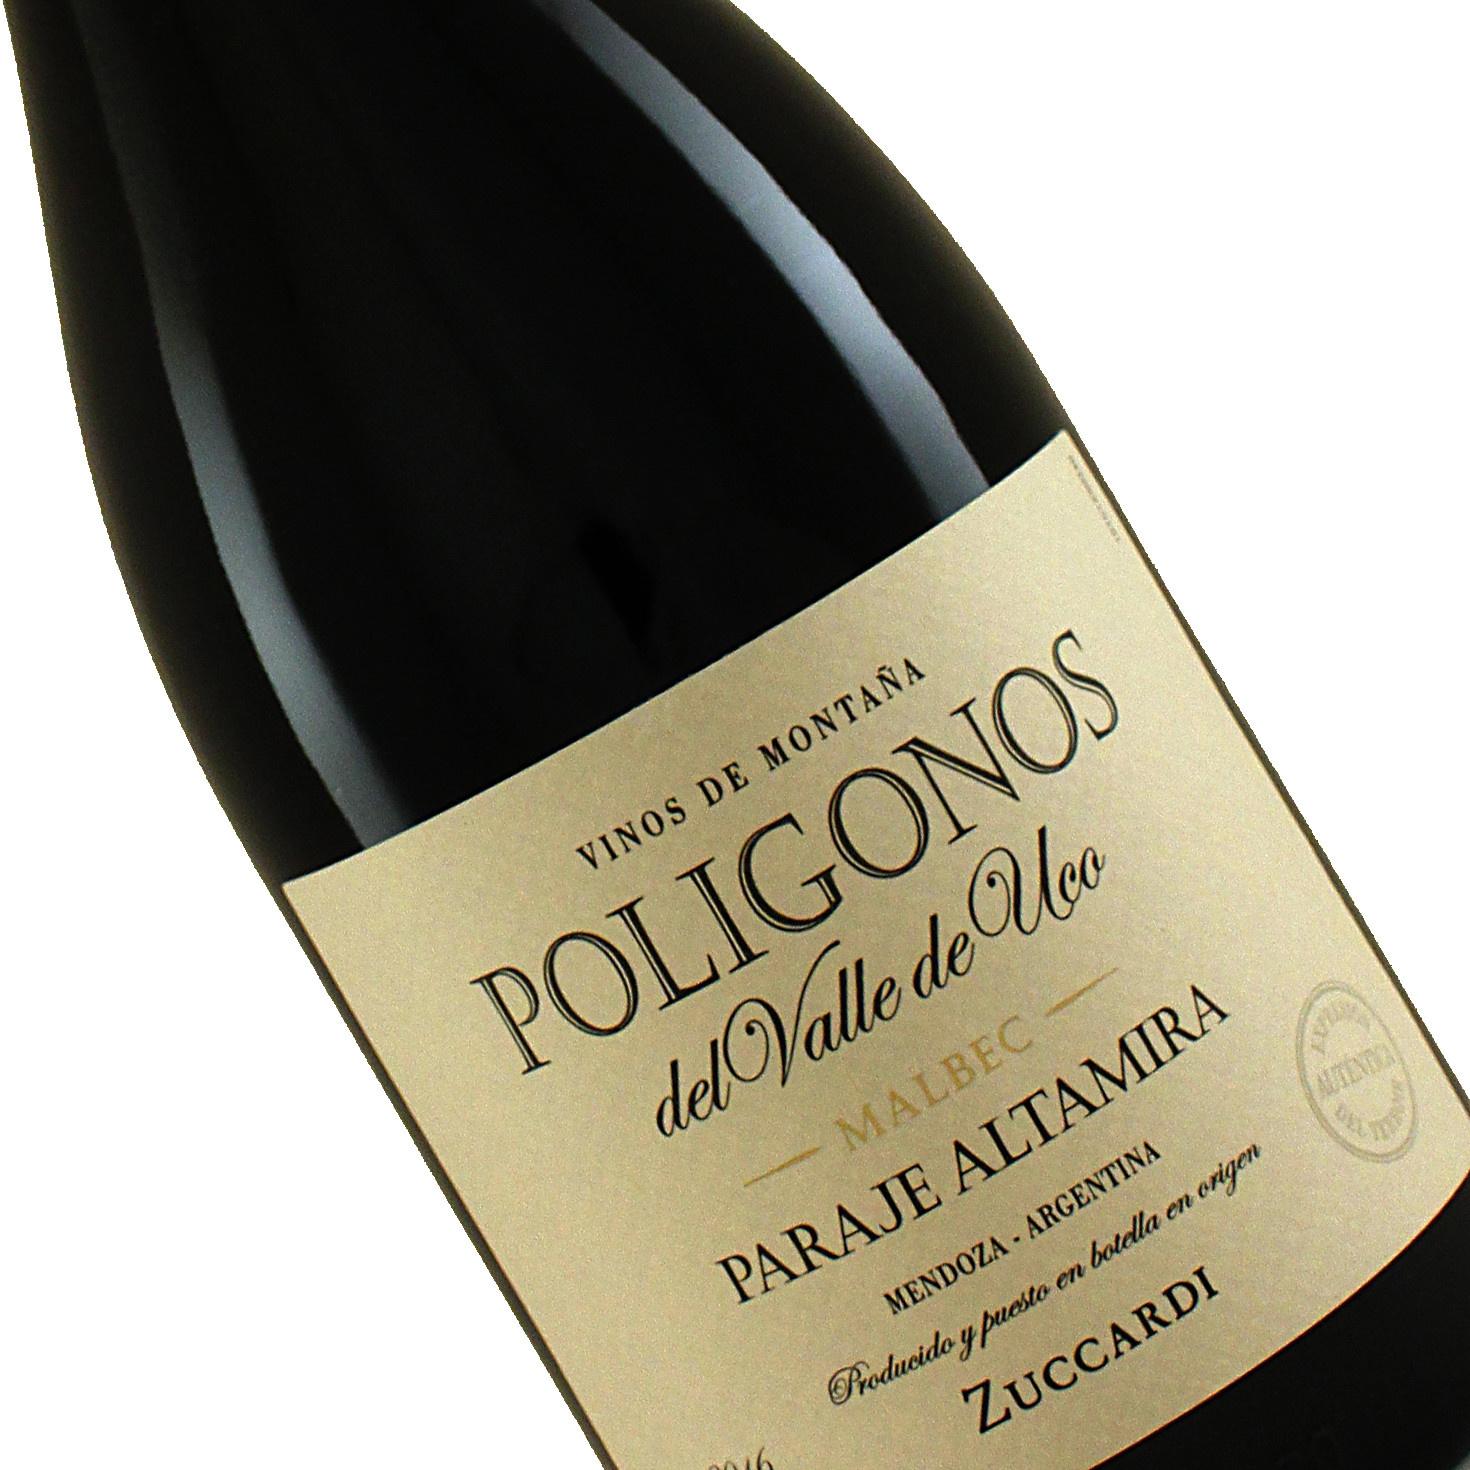 Zuccardi 2016 Poligonos Malbec Altamira, Mendoza